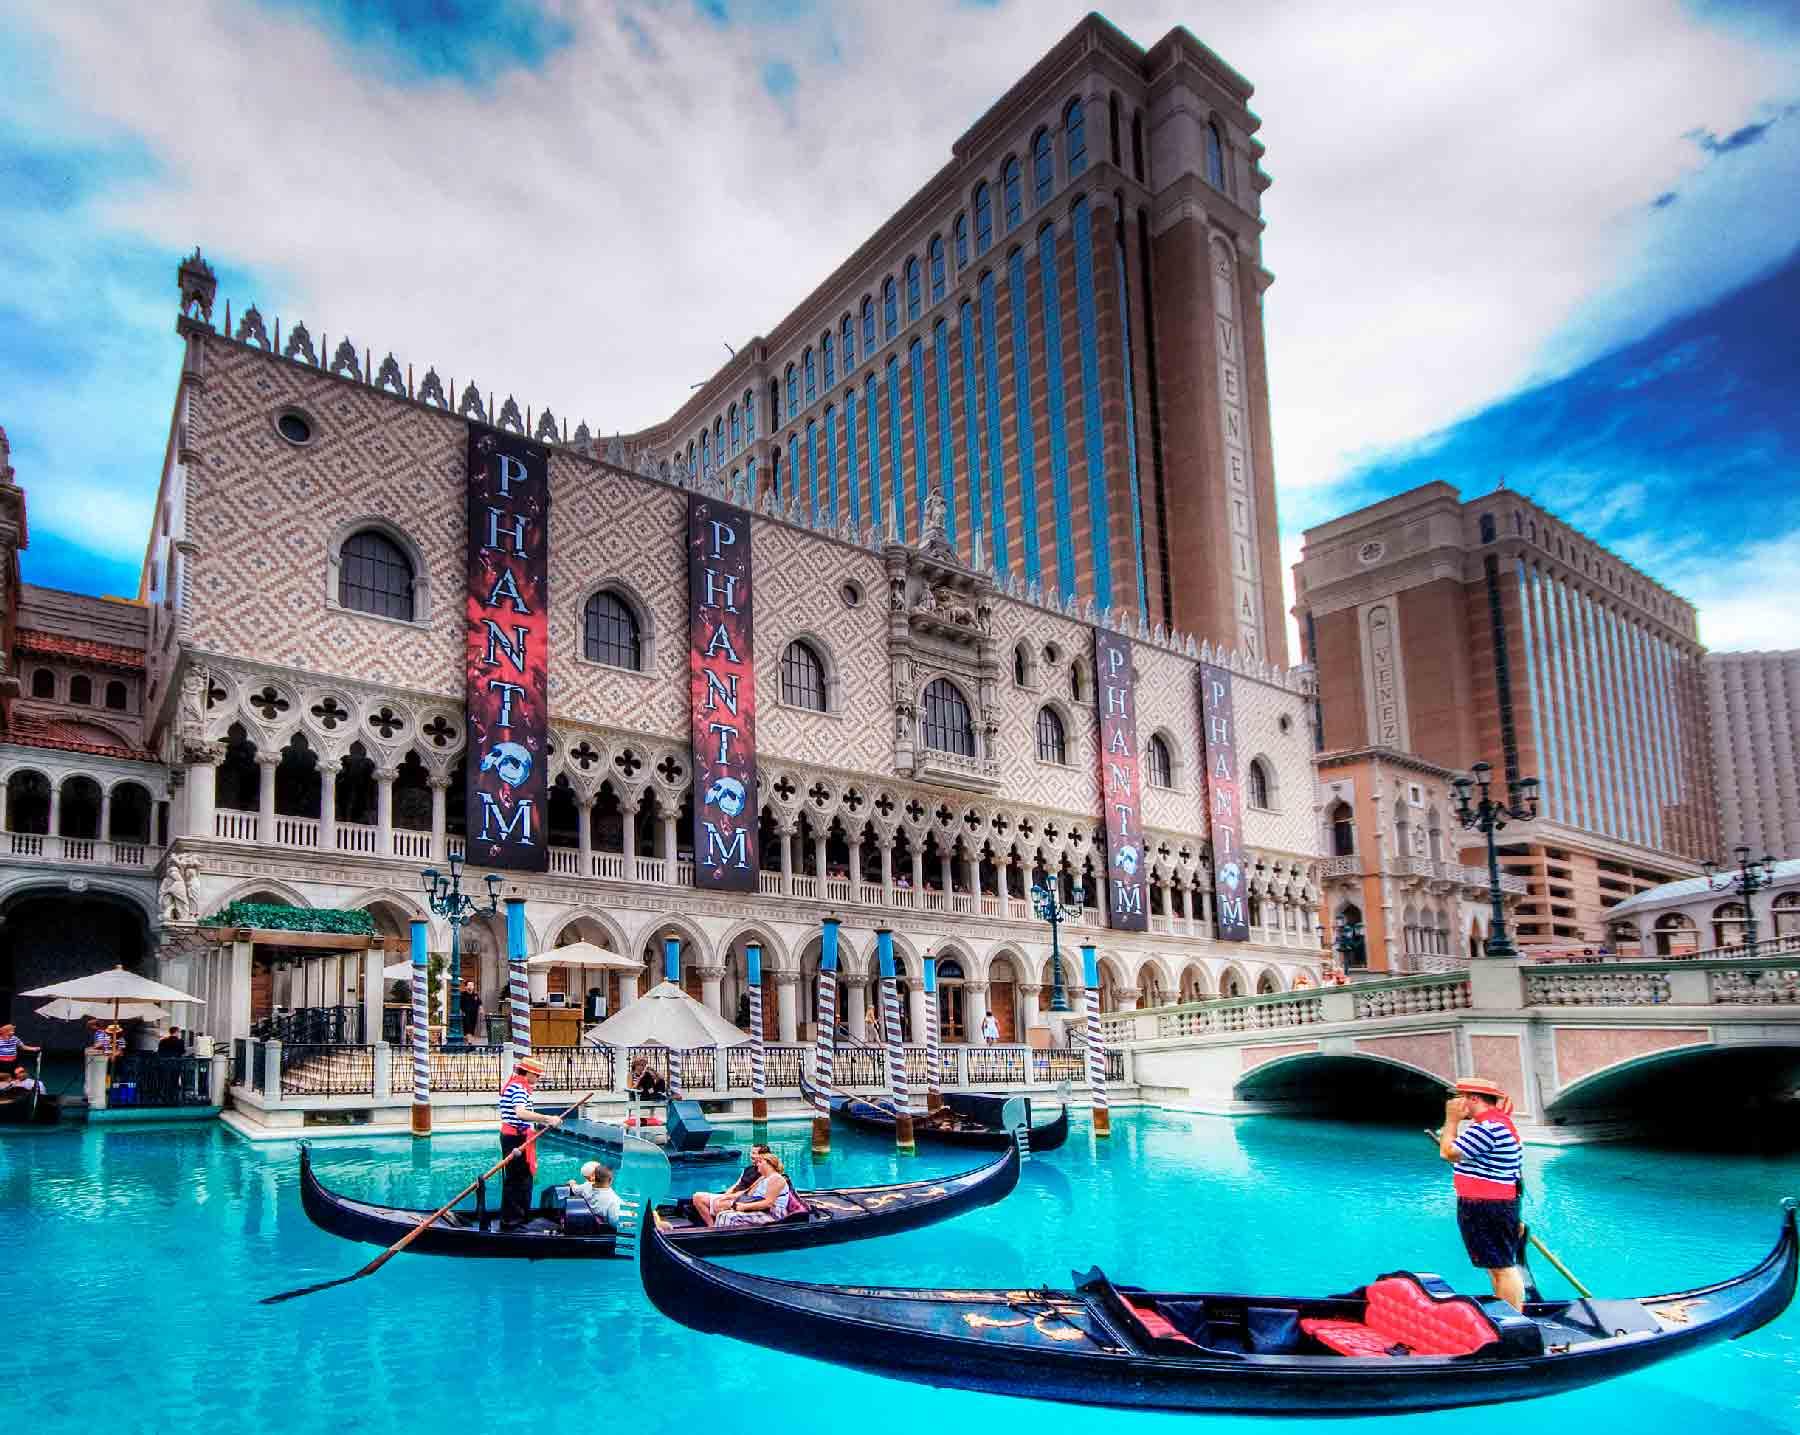 Pokeren in Las Vegas: The Venetian